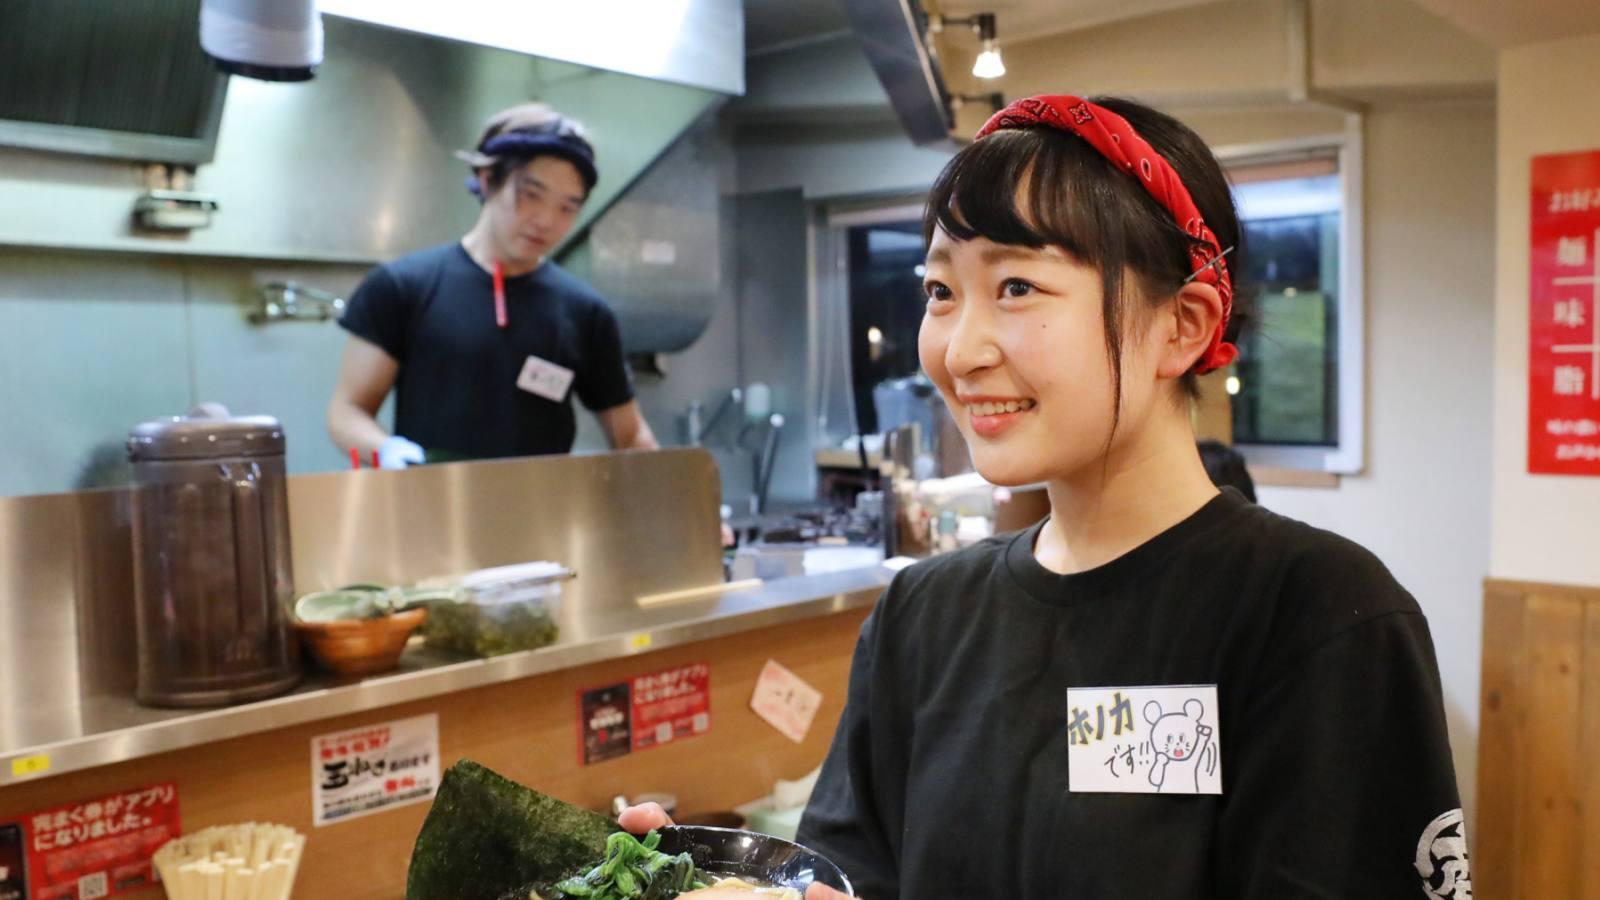 A part-time worker at a ramen shop in Tokyo.